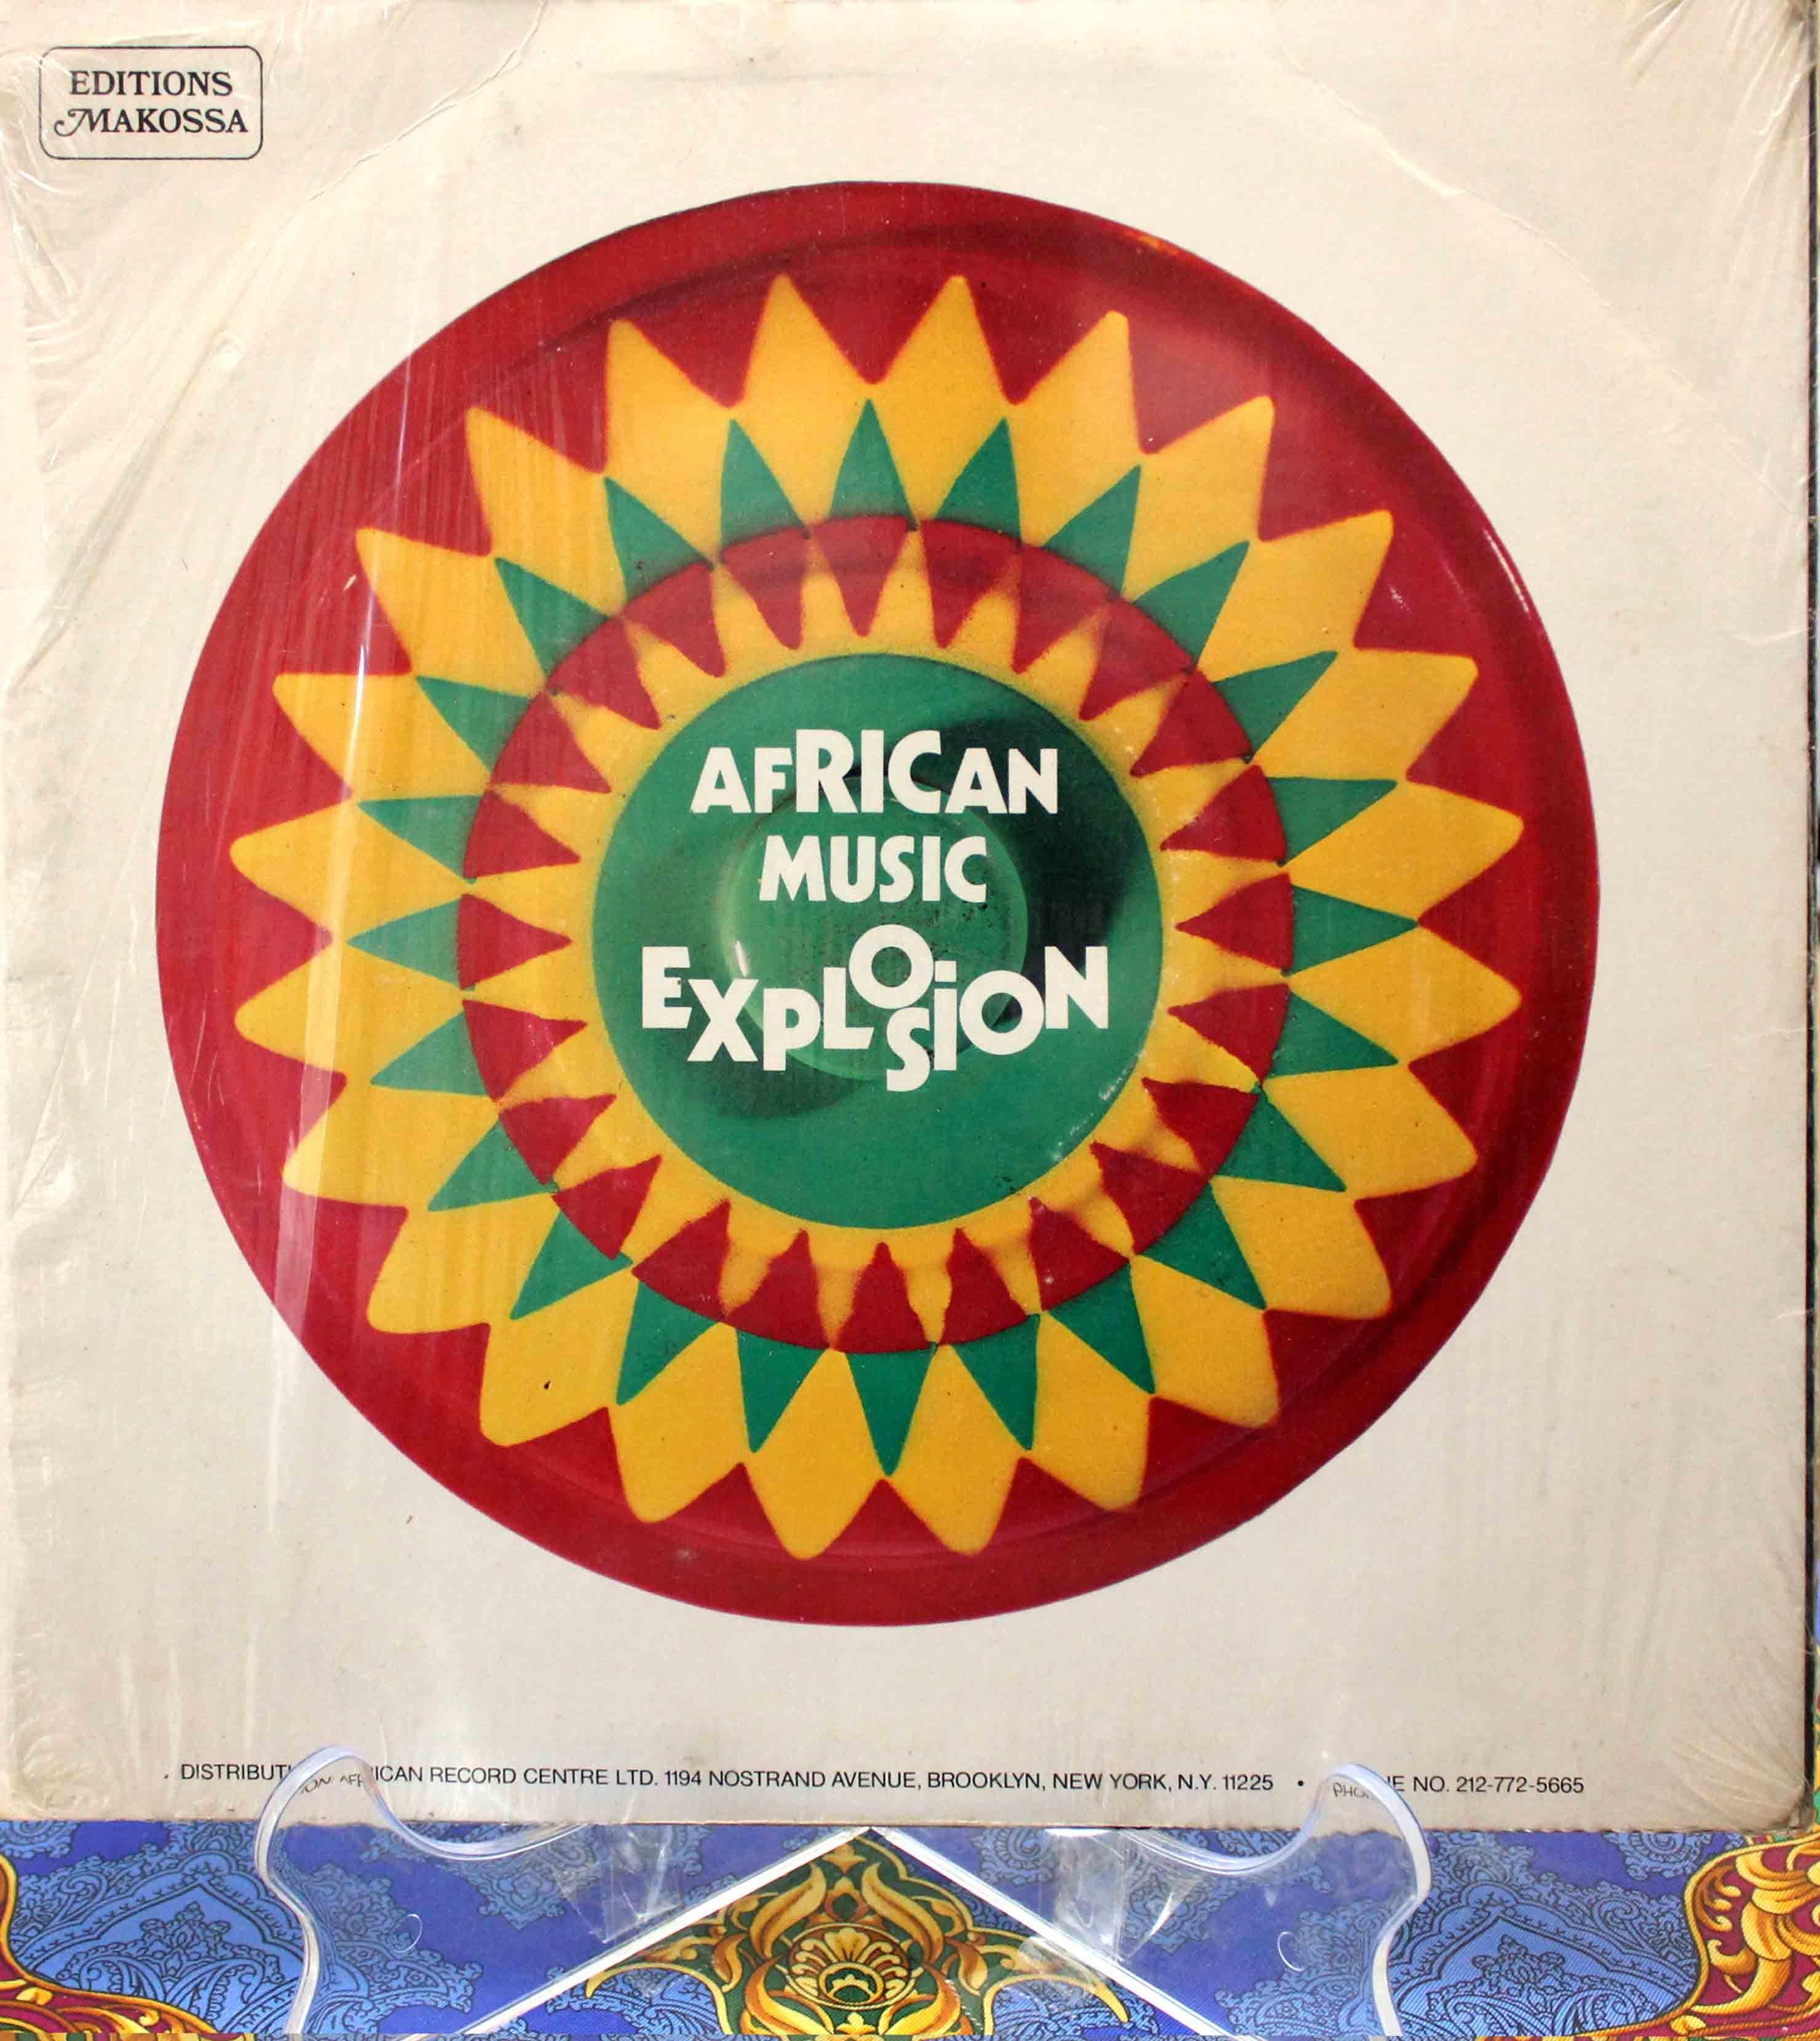 Lafayette Afro Rock Band – Voodounon 02